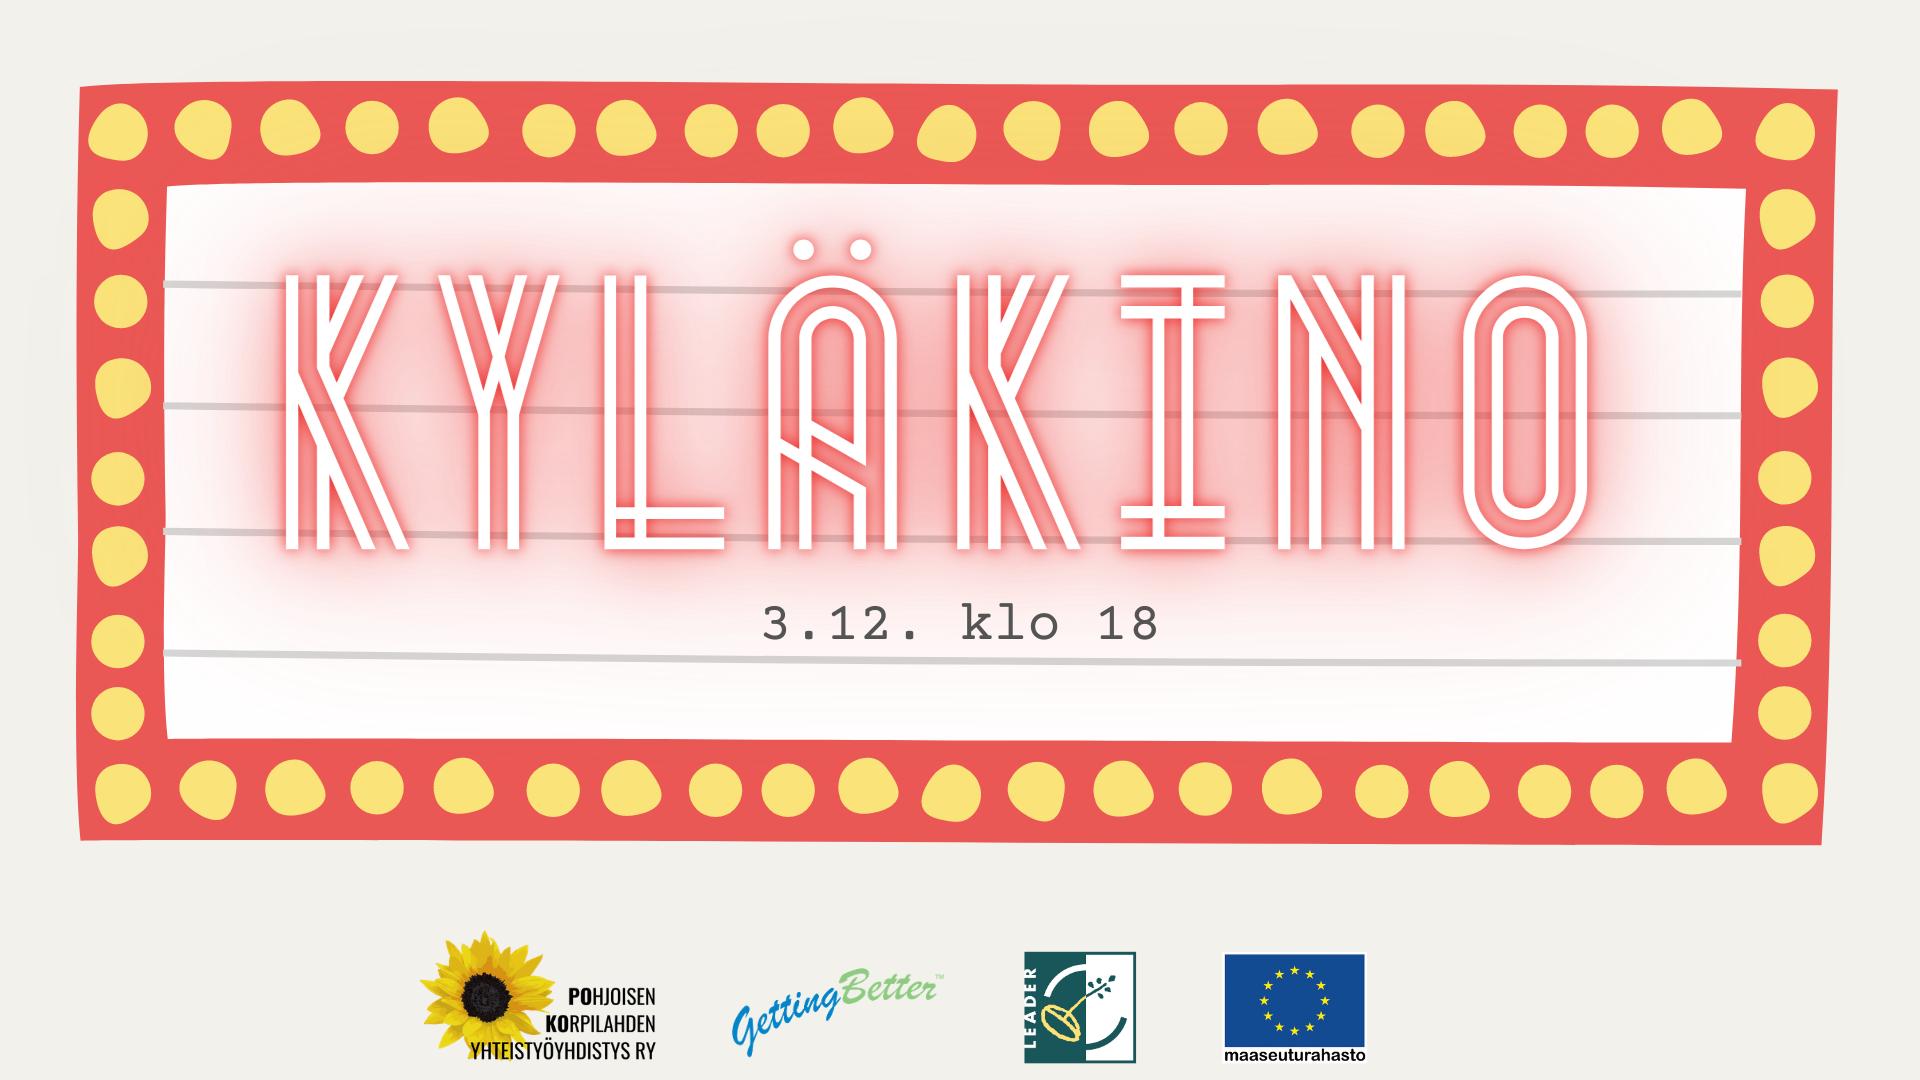 Kyläkino live stream 3.12. klo 18